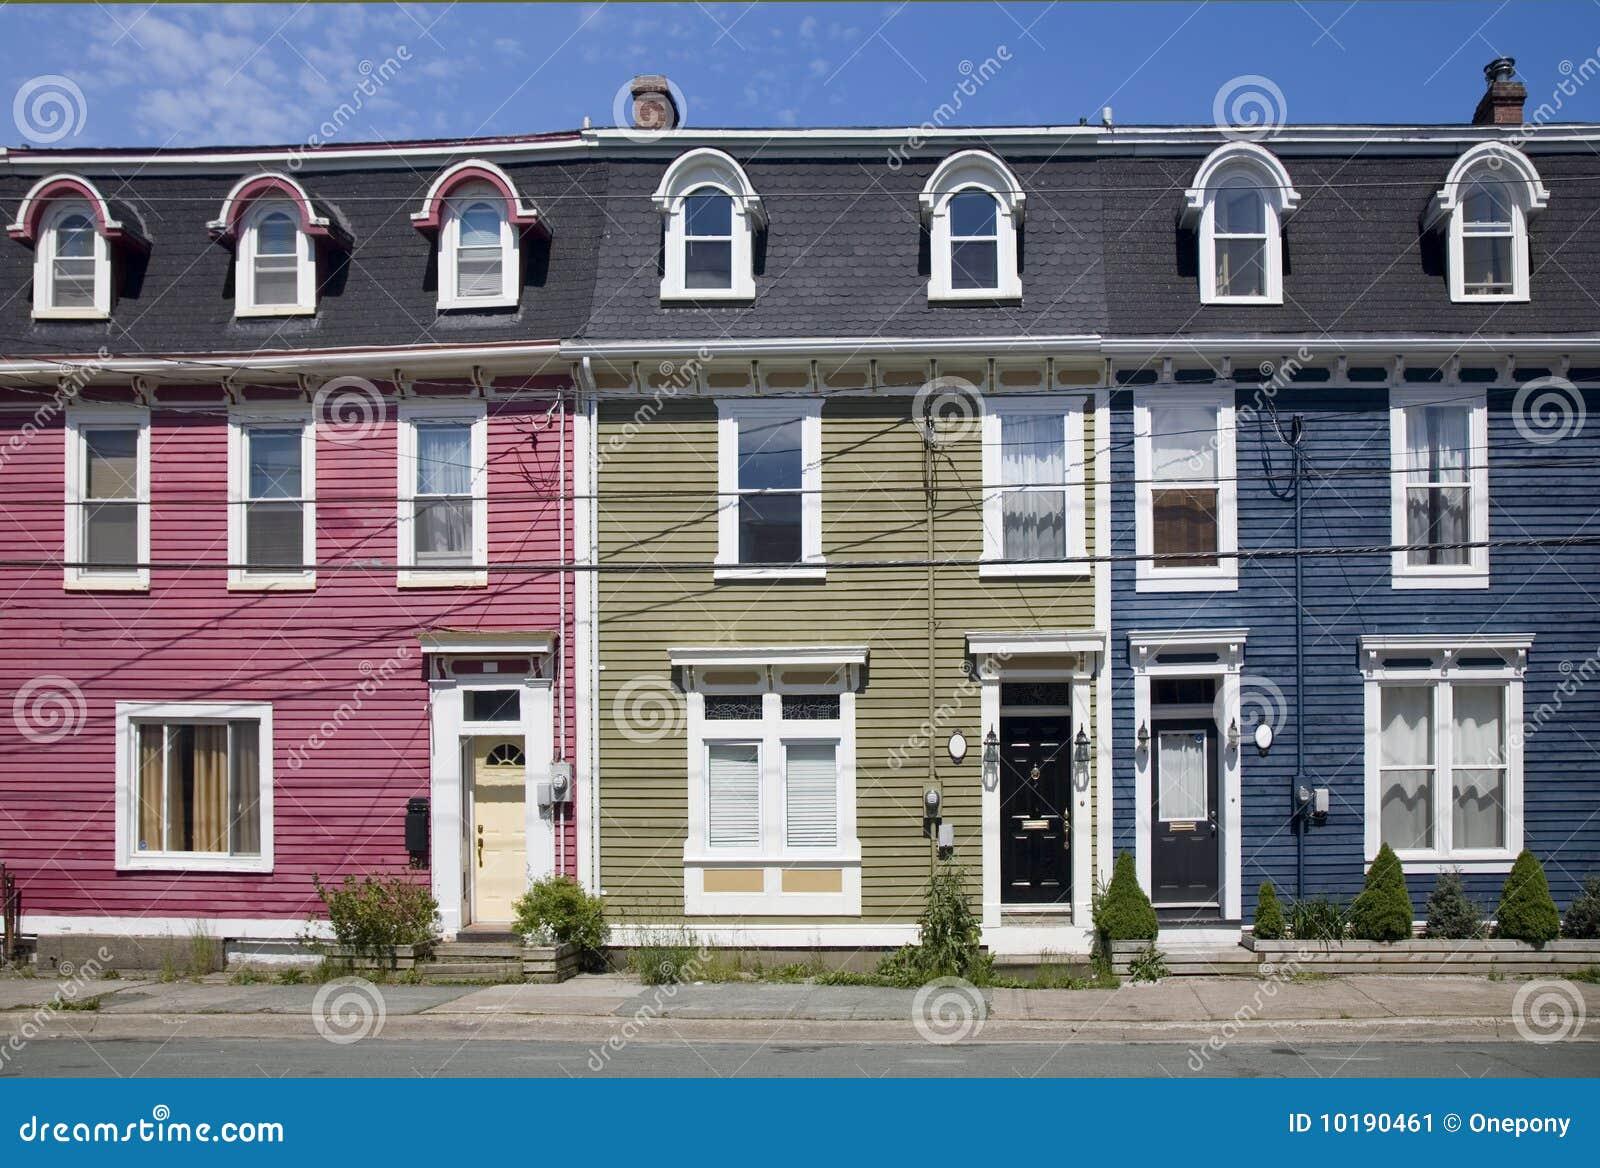 Row houses st john 39 s newfoundland stock image image for Newfoundland houses